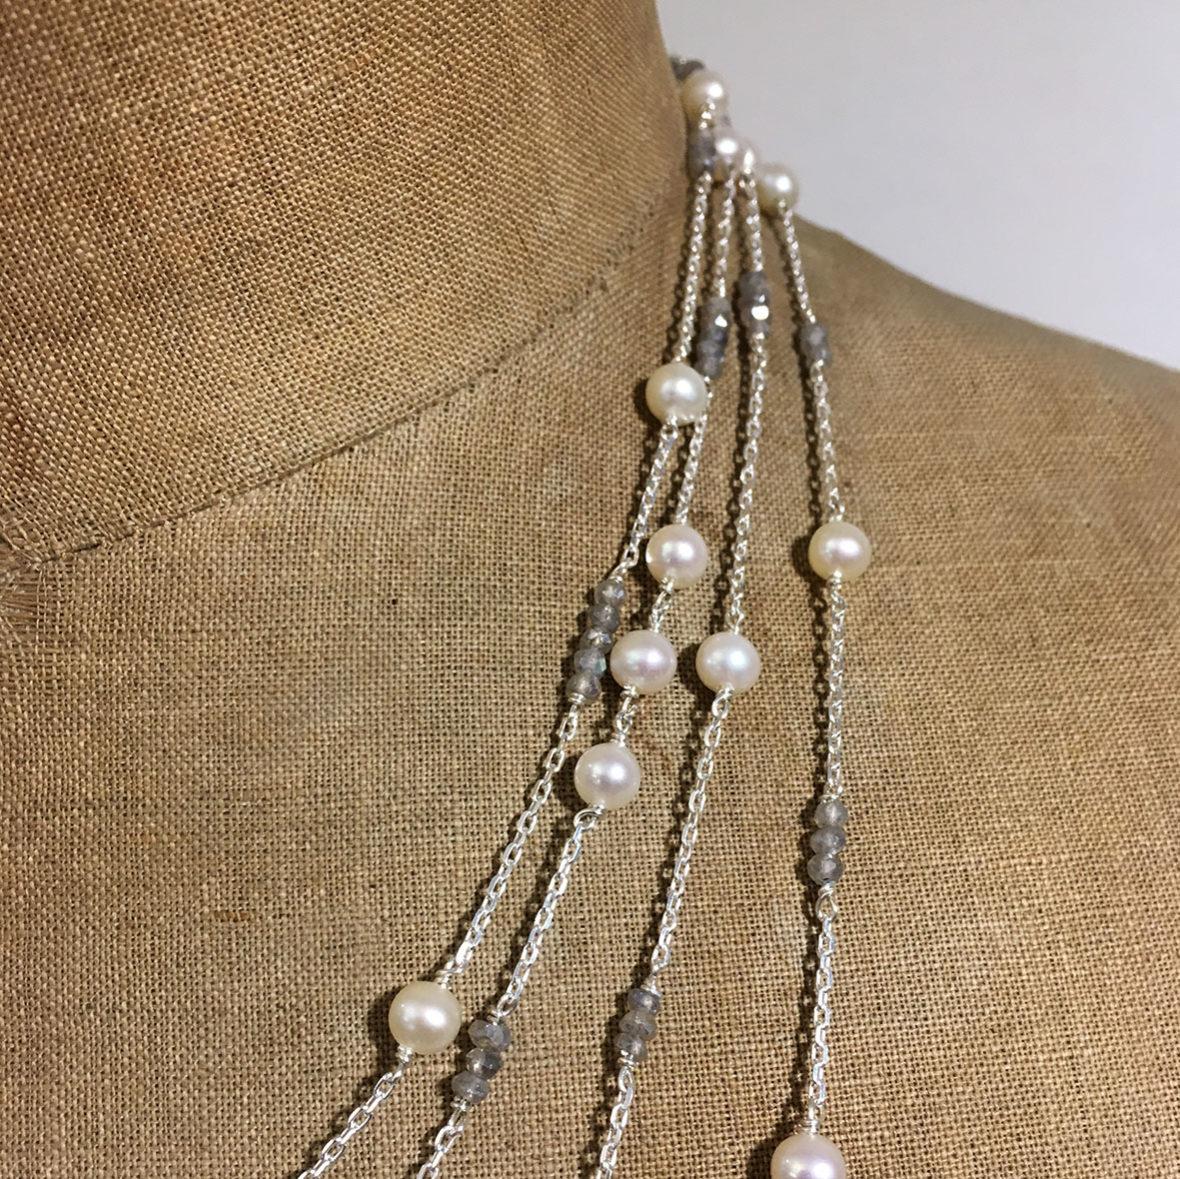 collection femme gros plan sautoir argent perles akoya perles labradorite sur mesure